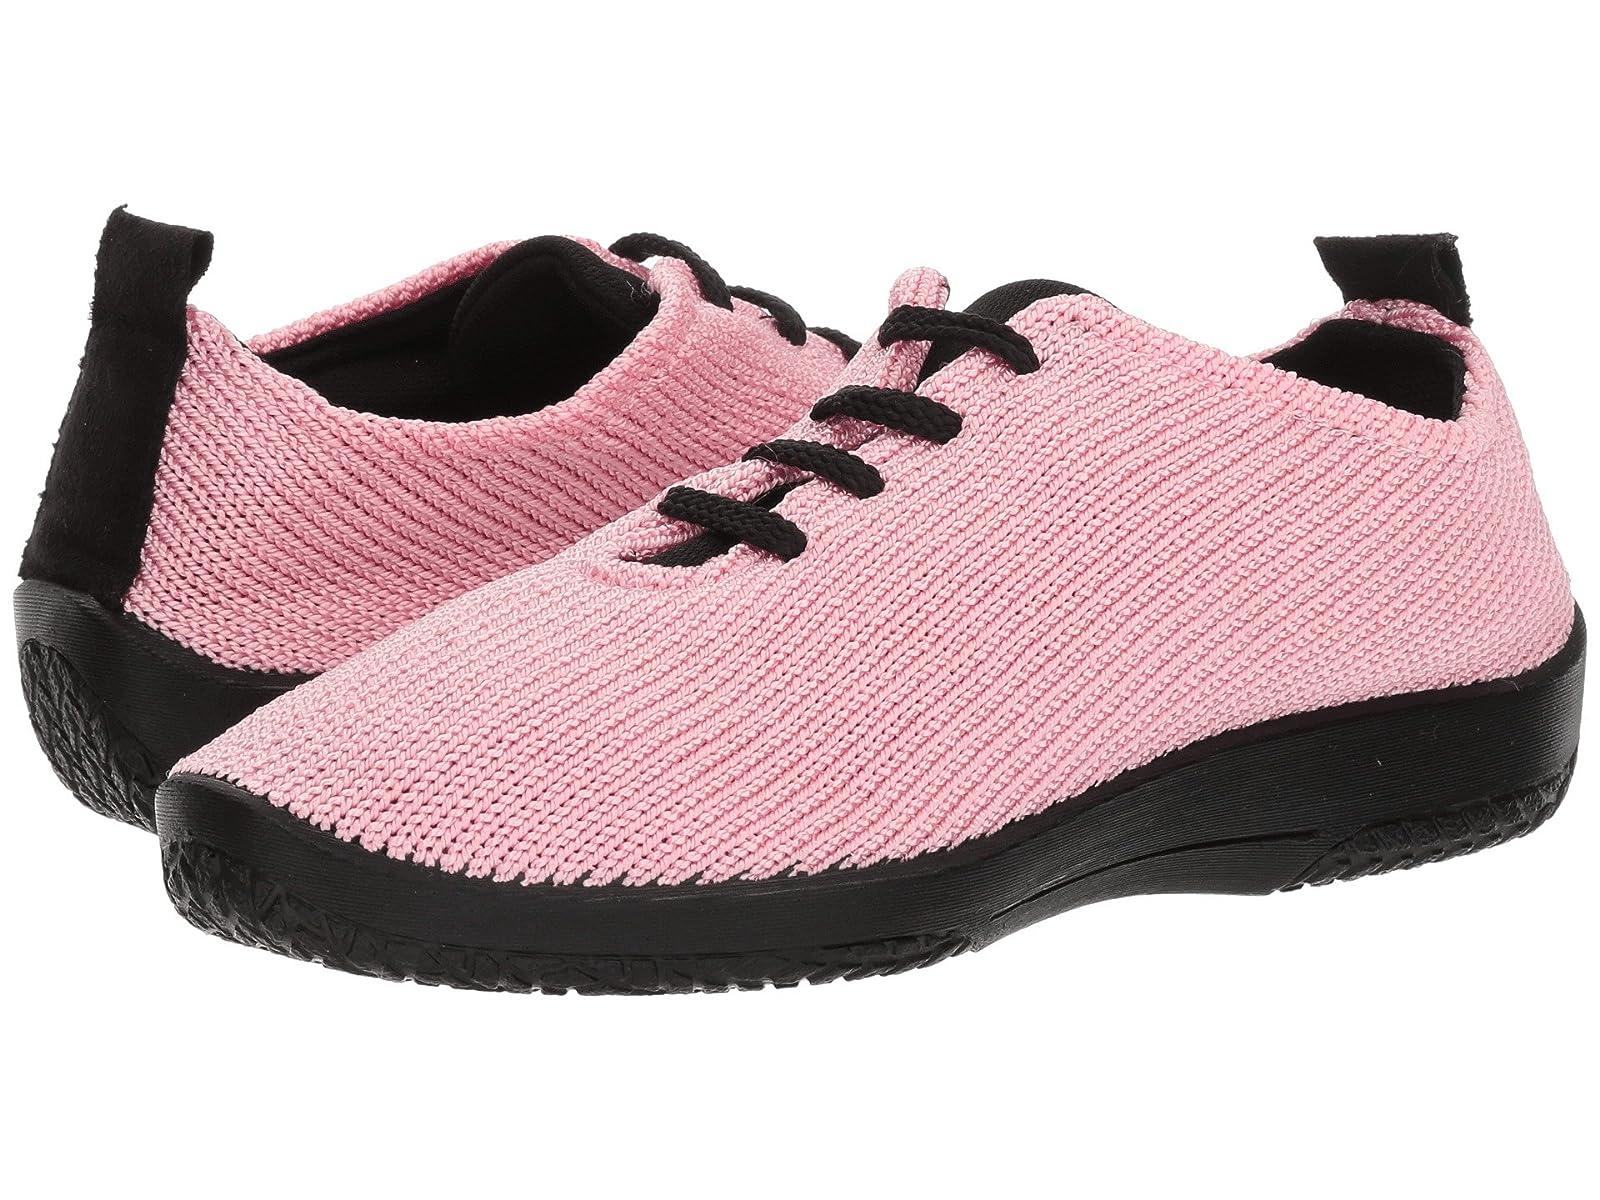 Arcopedico LSAtmospheric grades have affordable shoes